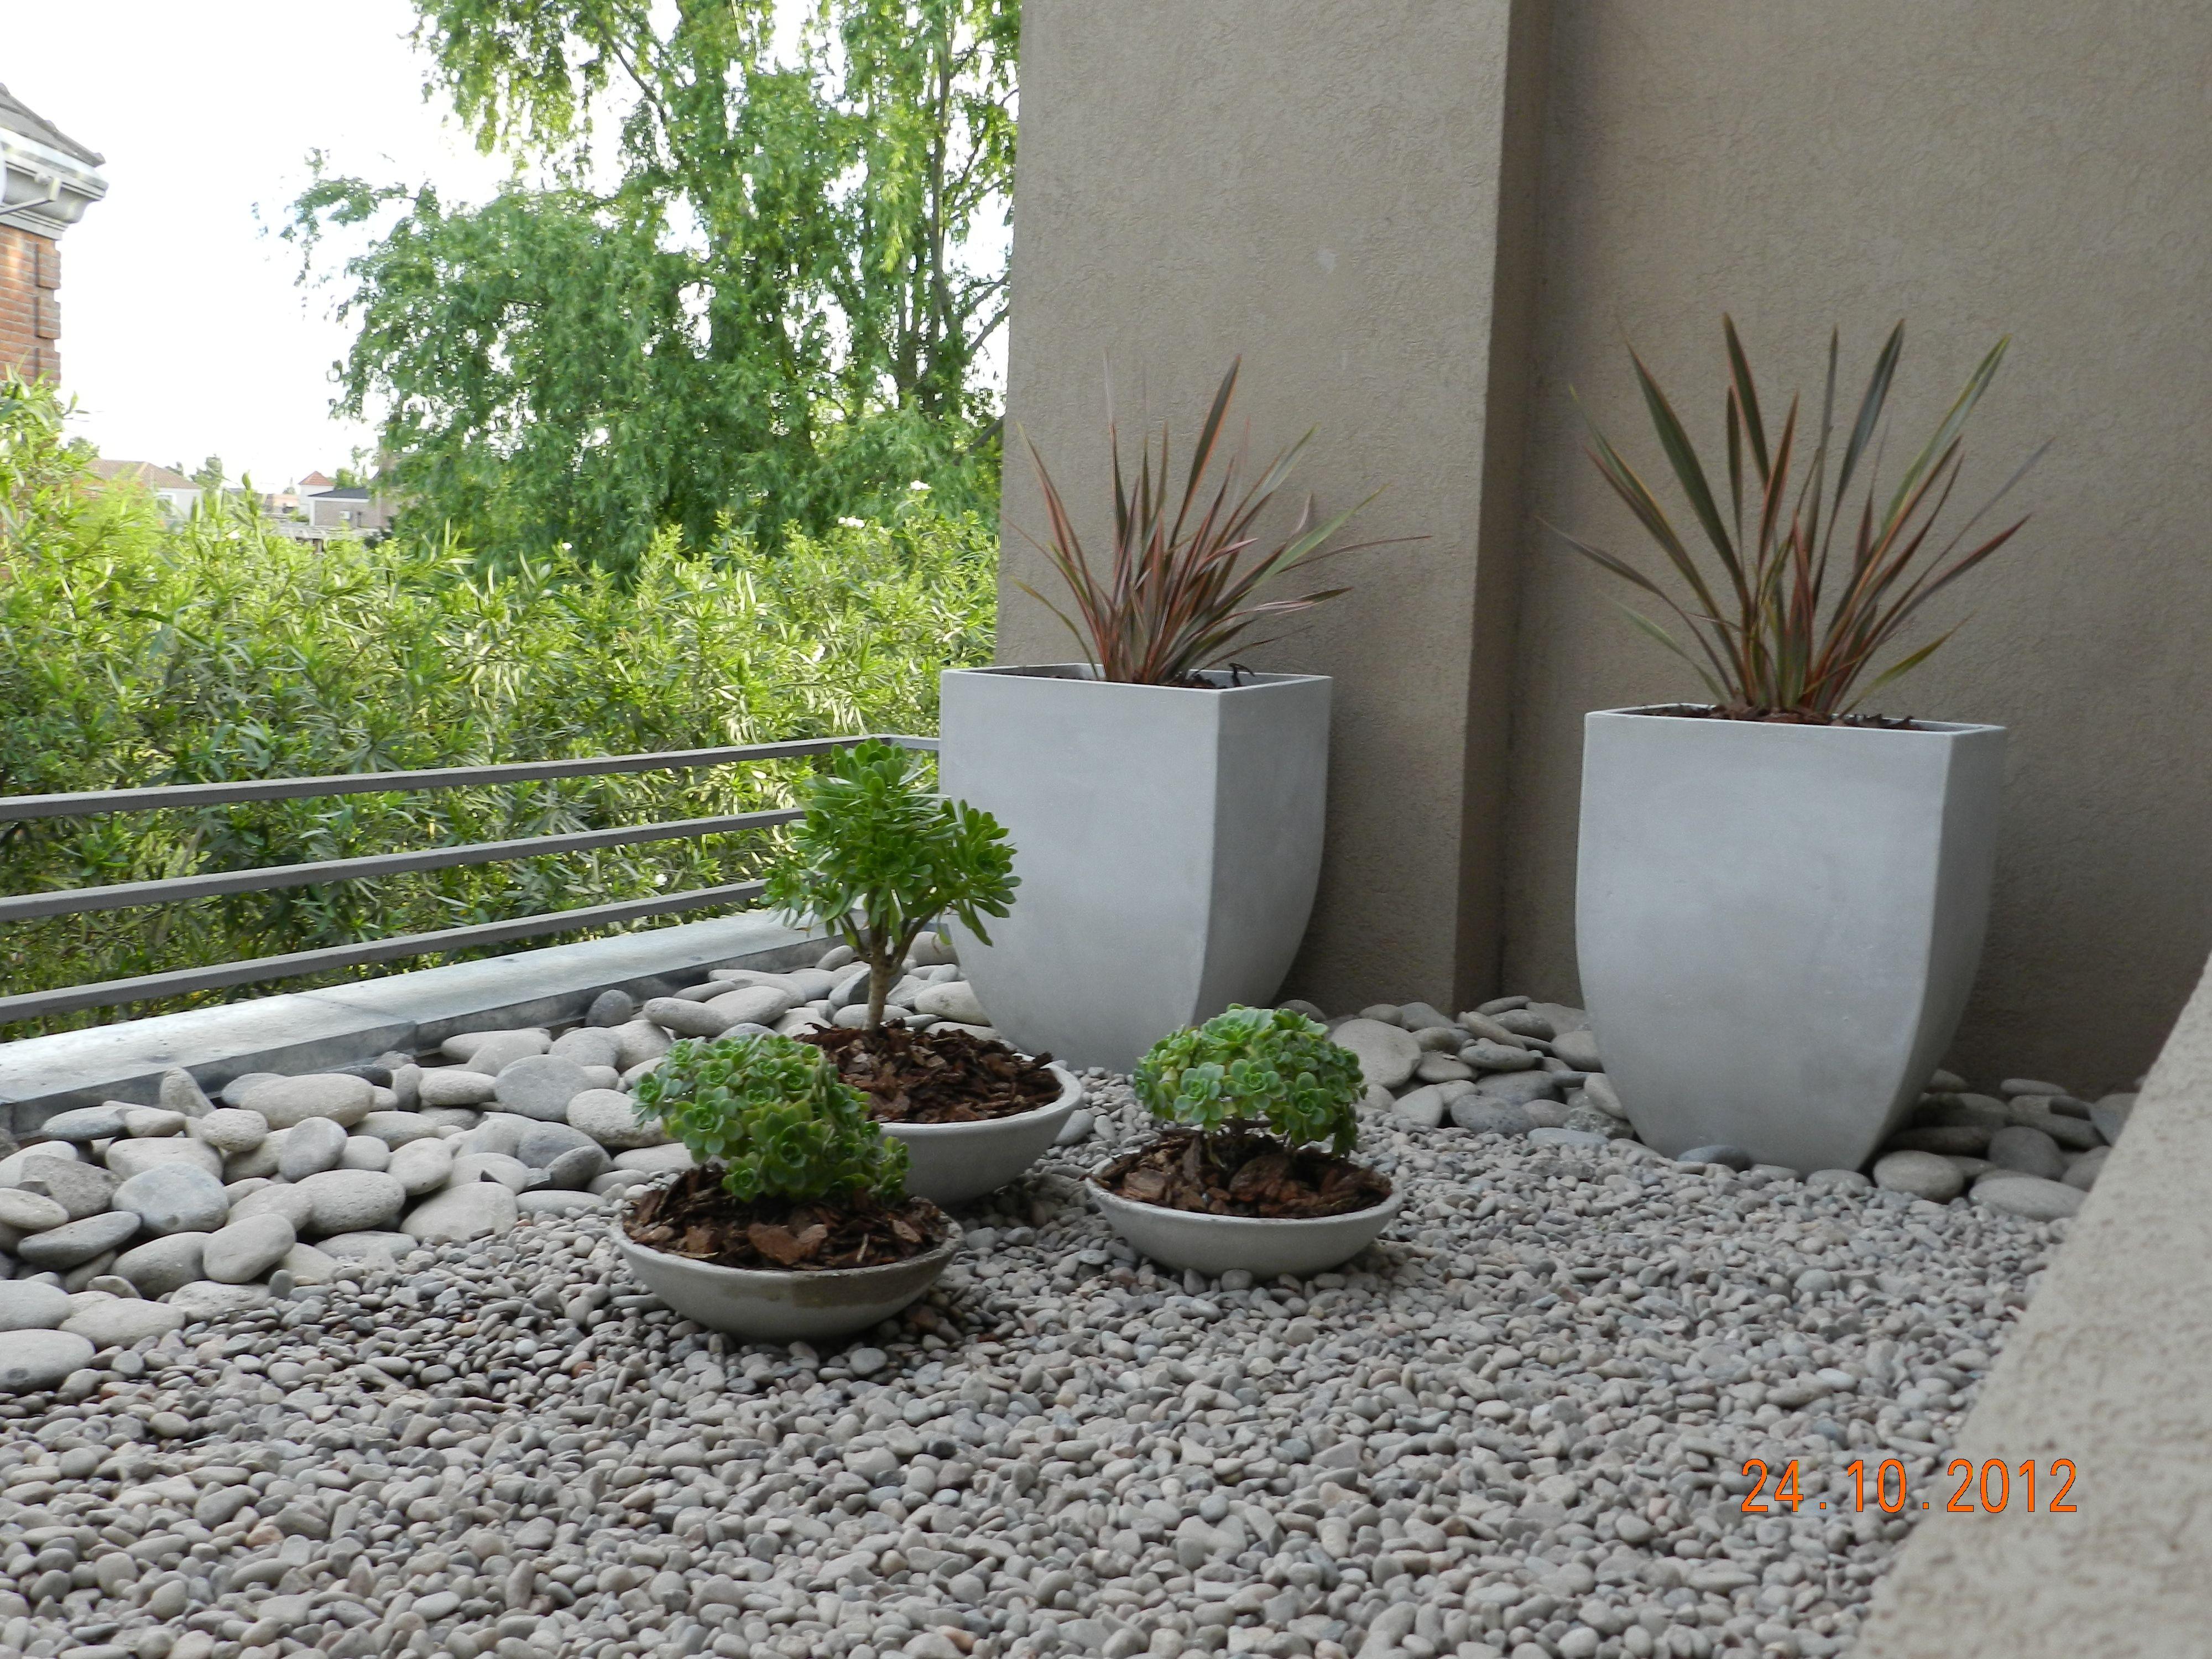 Terraza inaccesible con plantas que resisten poco riego - Plantas exterior terraza ...